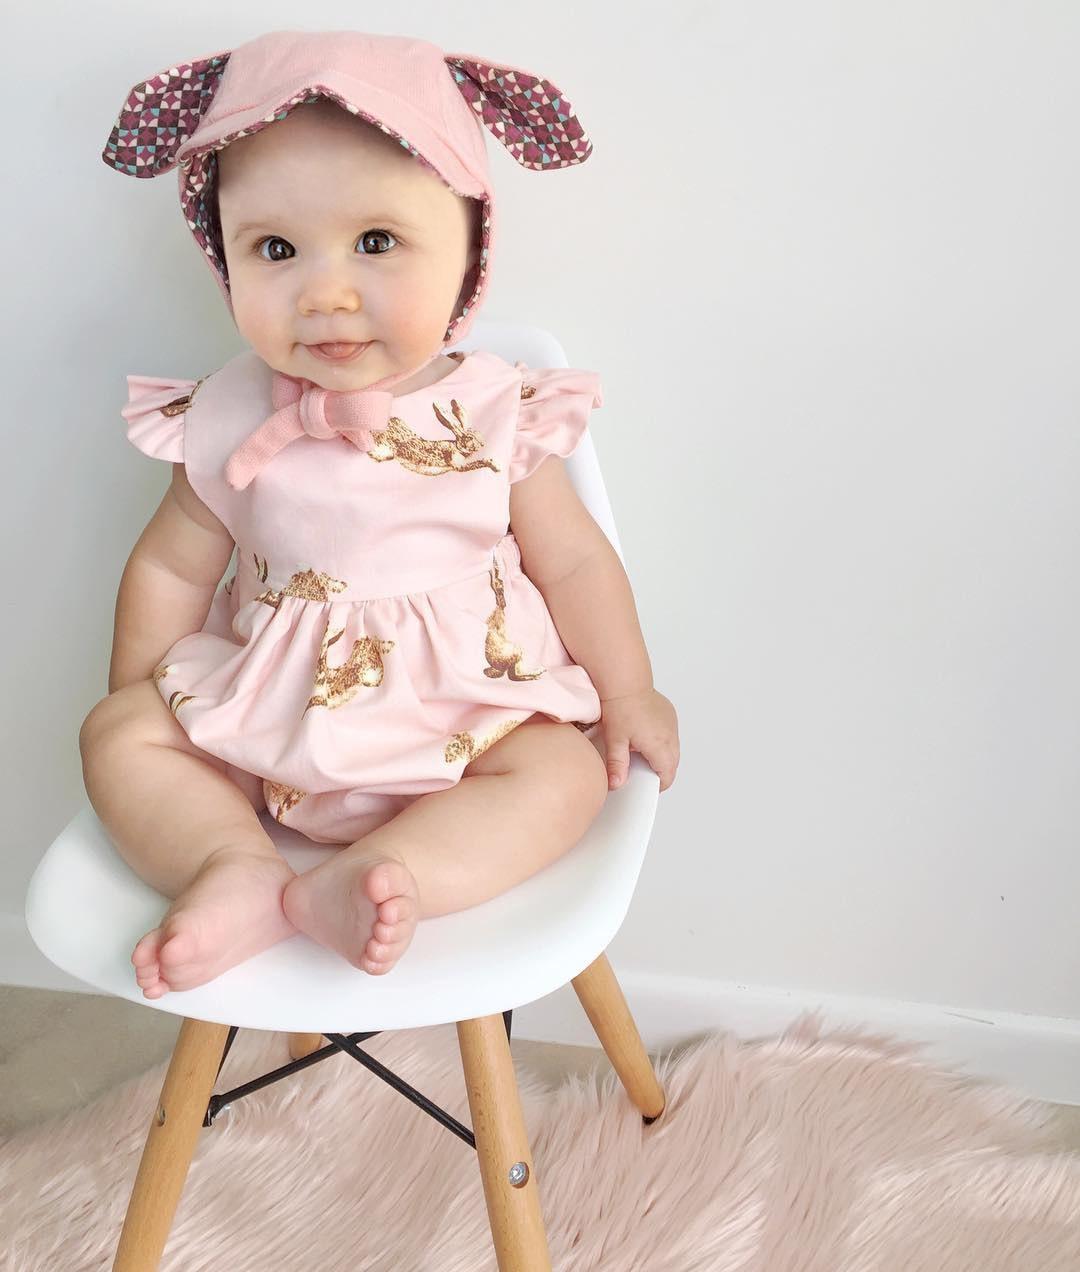 Mother & Kids Bodysuits & One-pieces Newborn Kid Girls Clothing New Baby Girl Bunny Rabbit Deer Bodysuits Jumpsuit Playsuit Oufits Sunsuit Costume